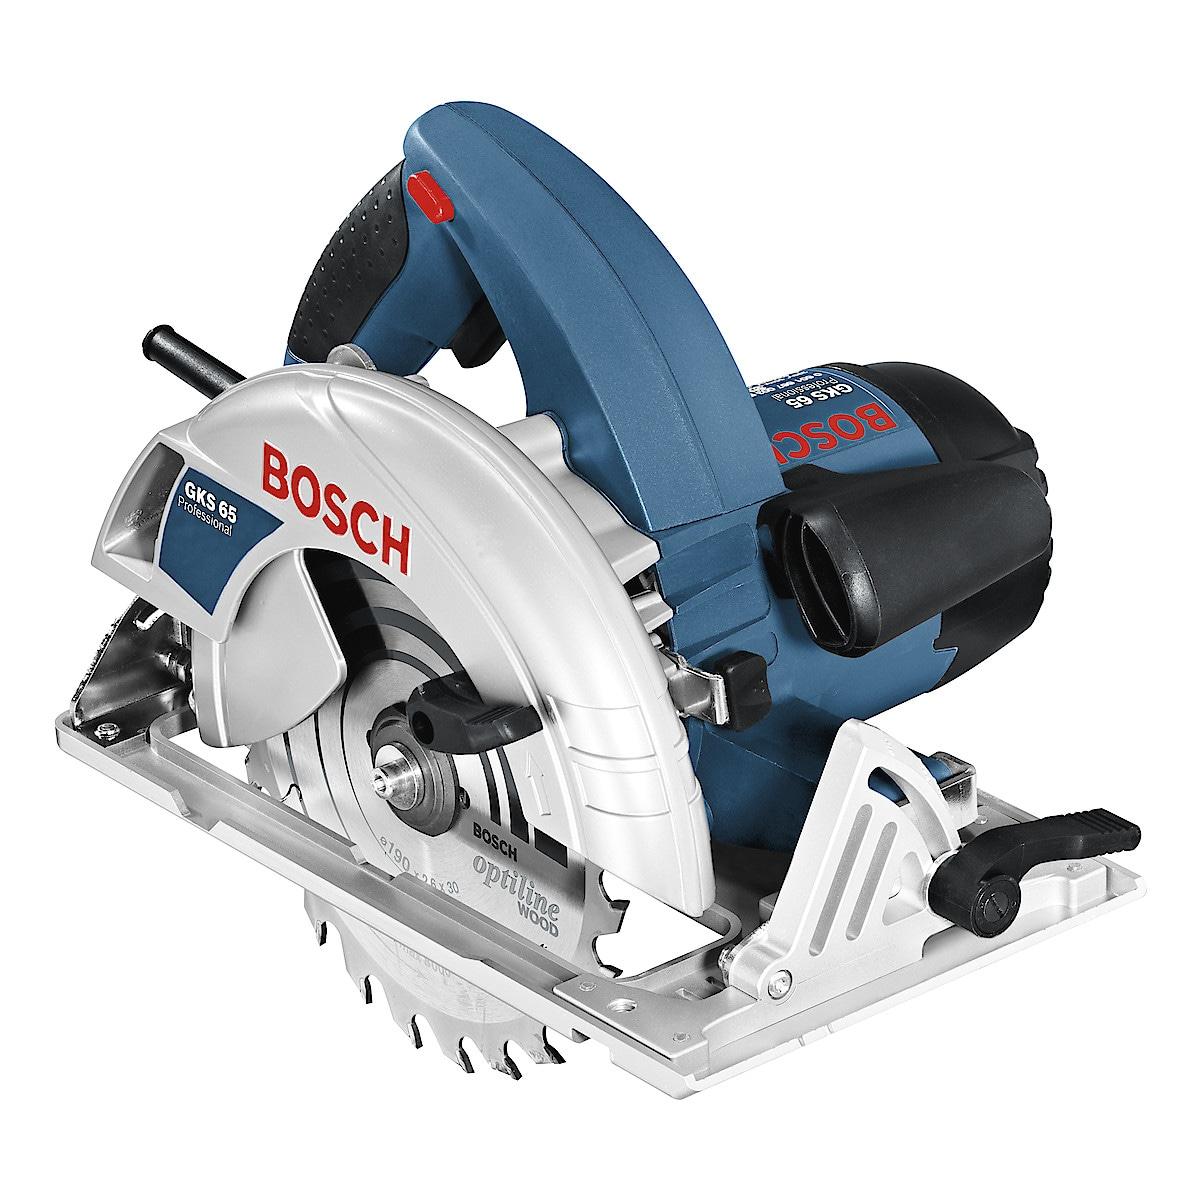 Cirkelsåg Bosch GKS 65 Professional